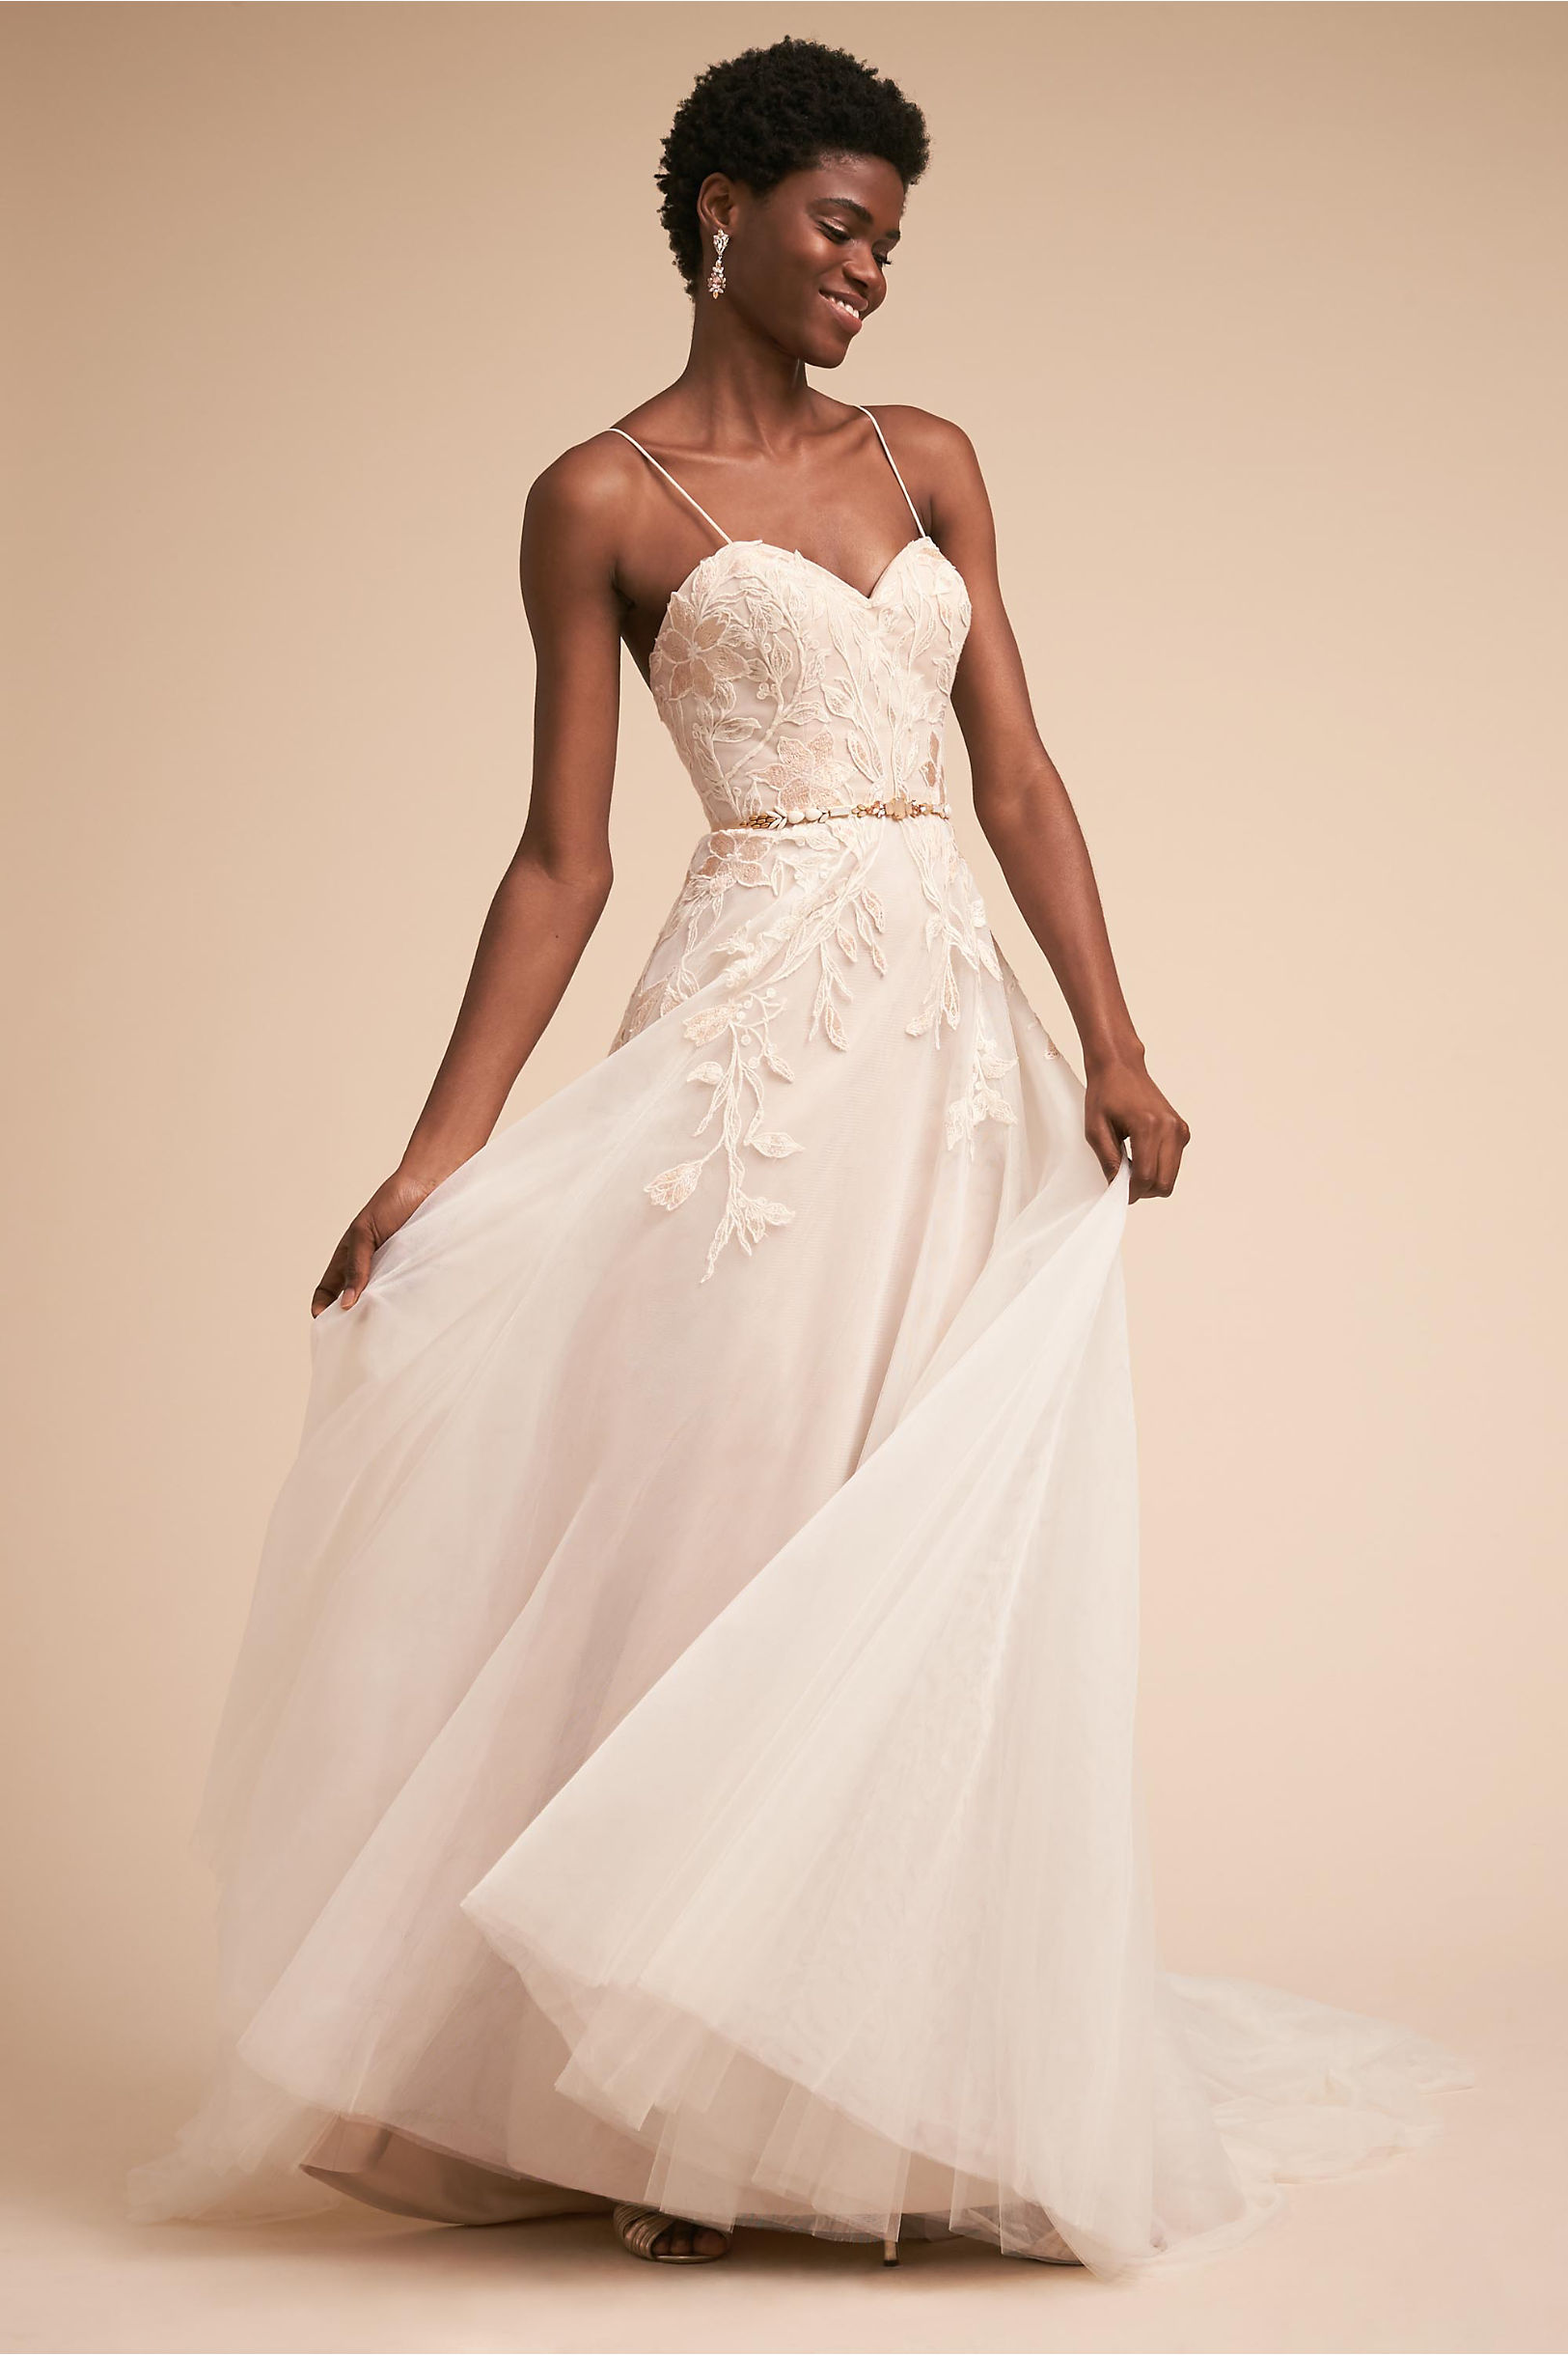 Wedding Dresses: BHLDN Spring 2018 Bridal Collection - Inside Weddings